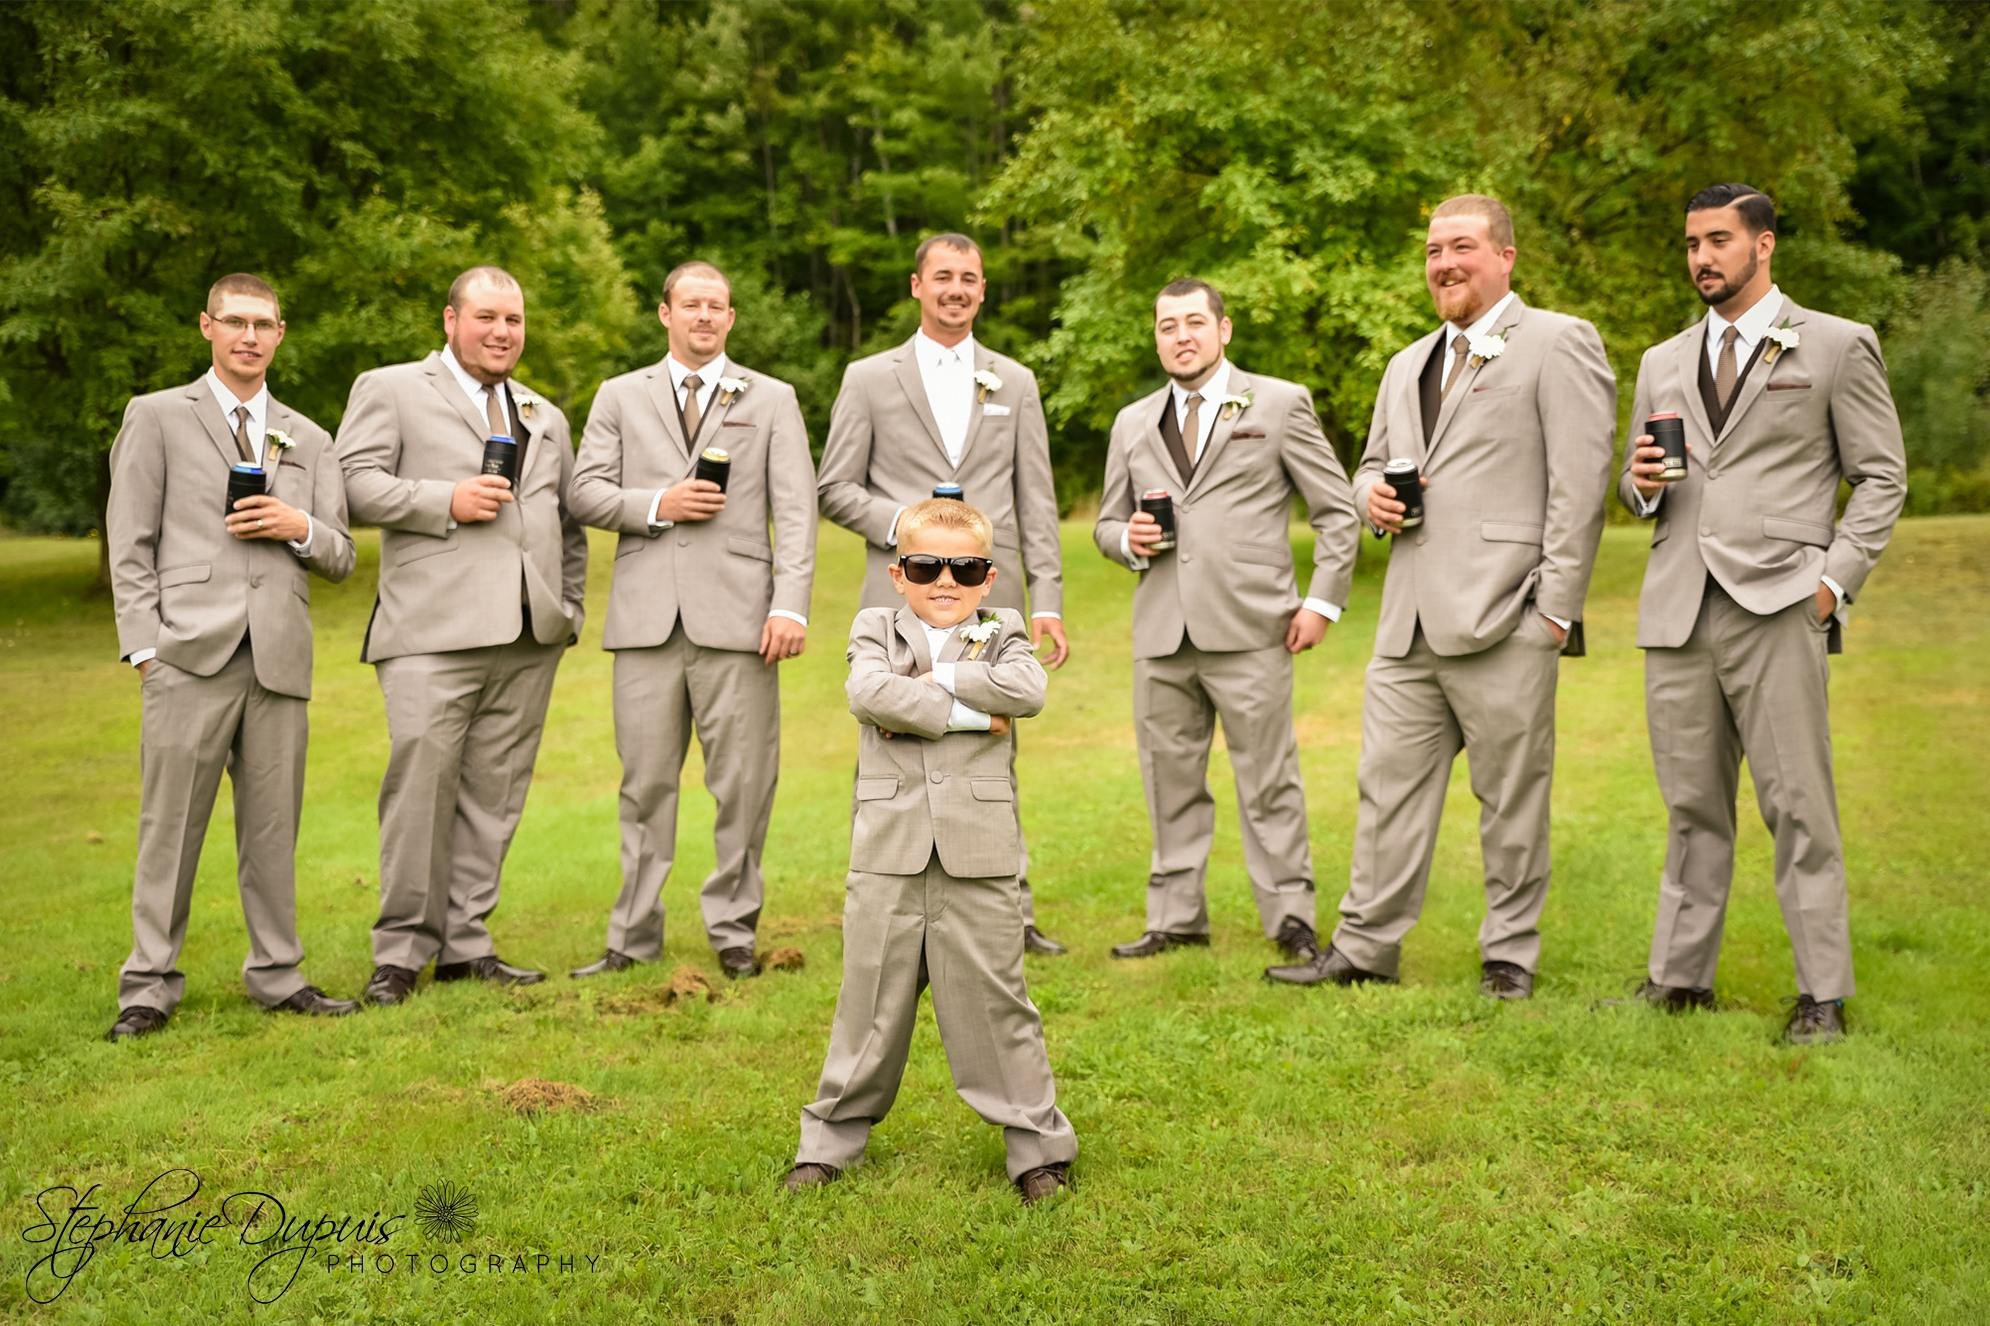 Berlin Wedding Photographer 03 4 - Portfolio: Nason Wedding